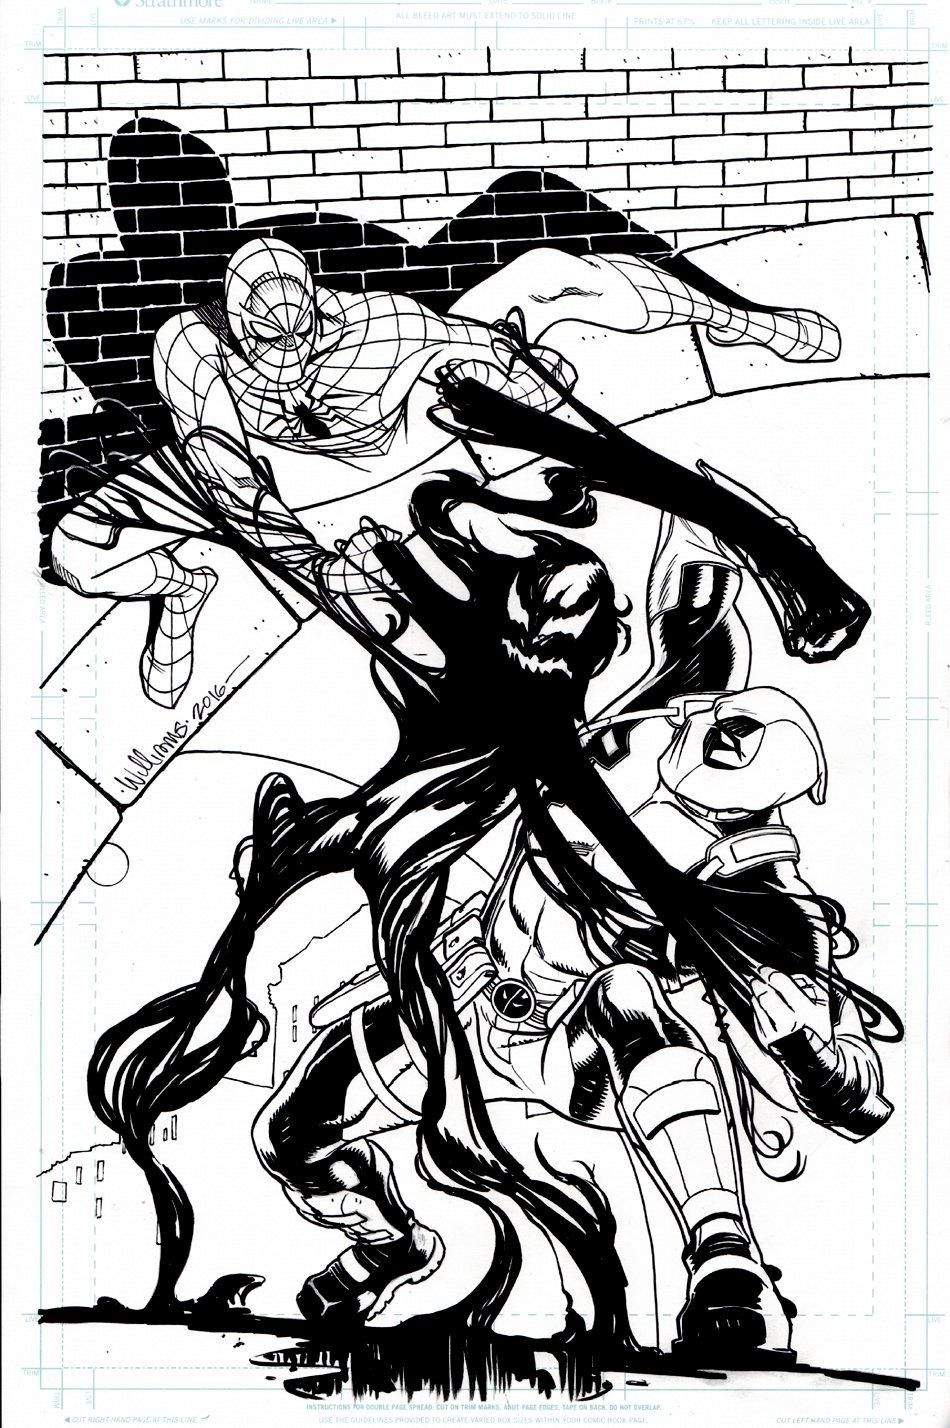 Spider-Man / Deadpool #15 Cover (2016)